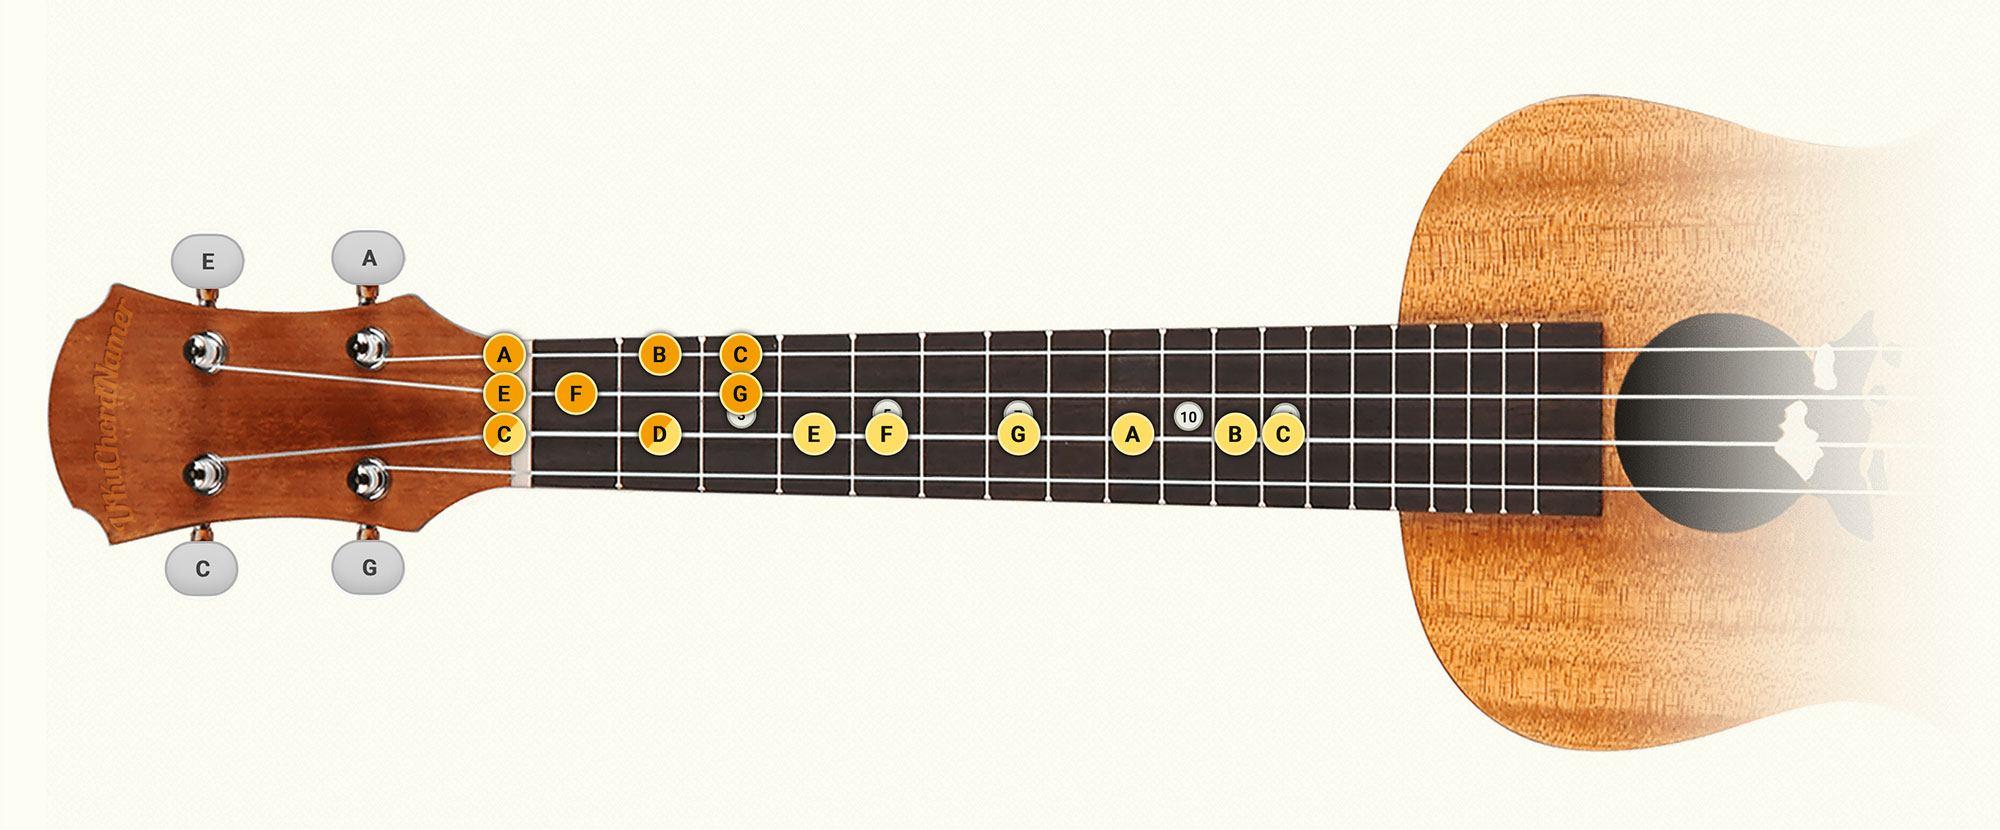 C major duo ukulele scale